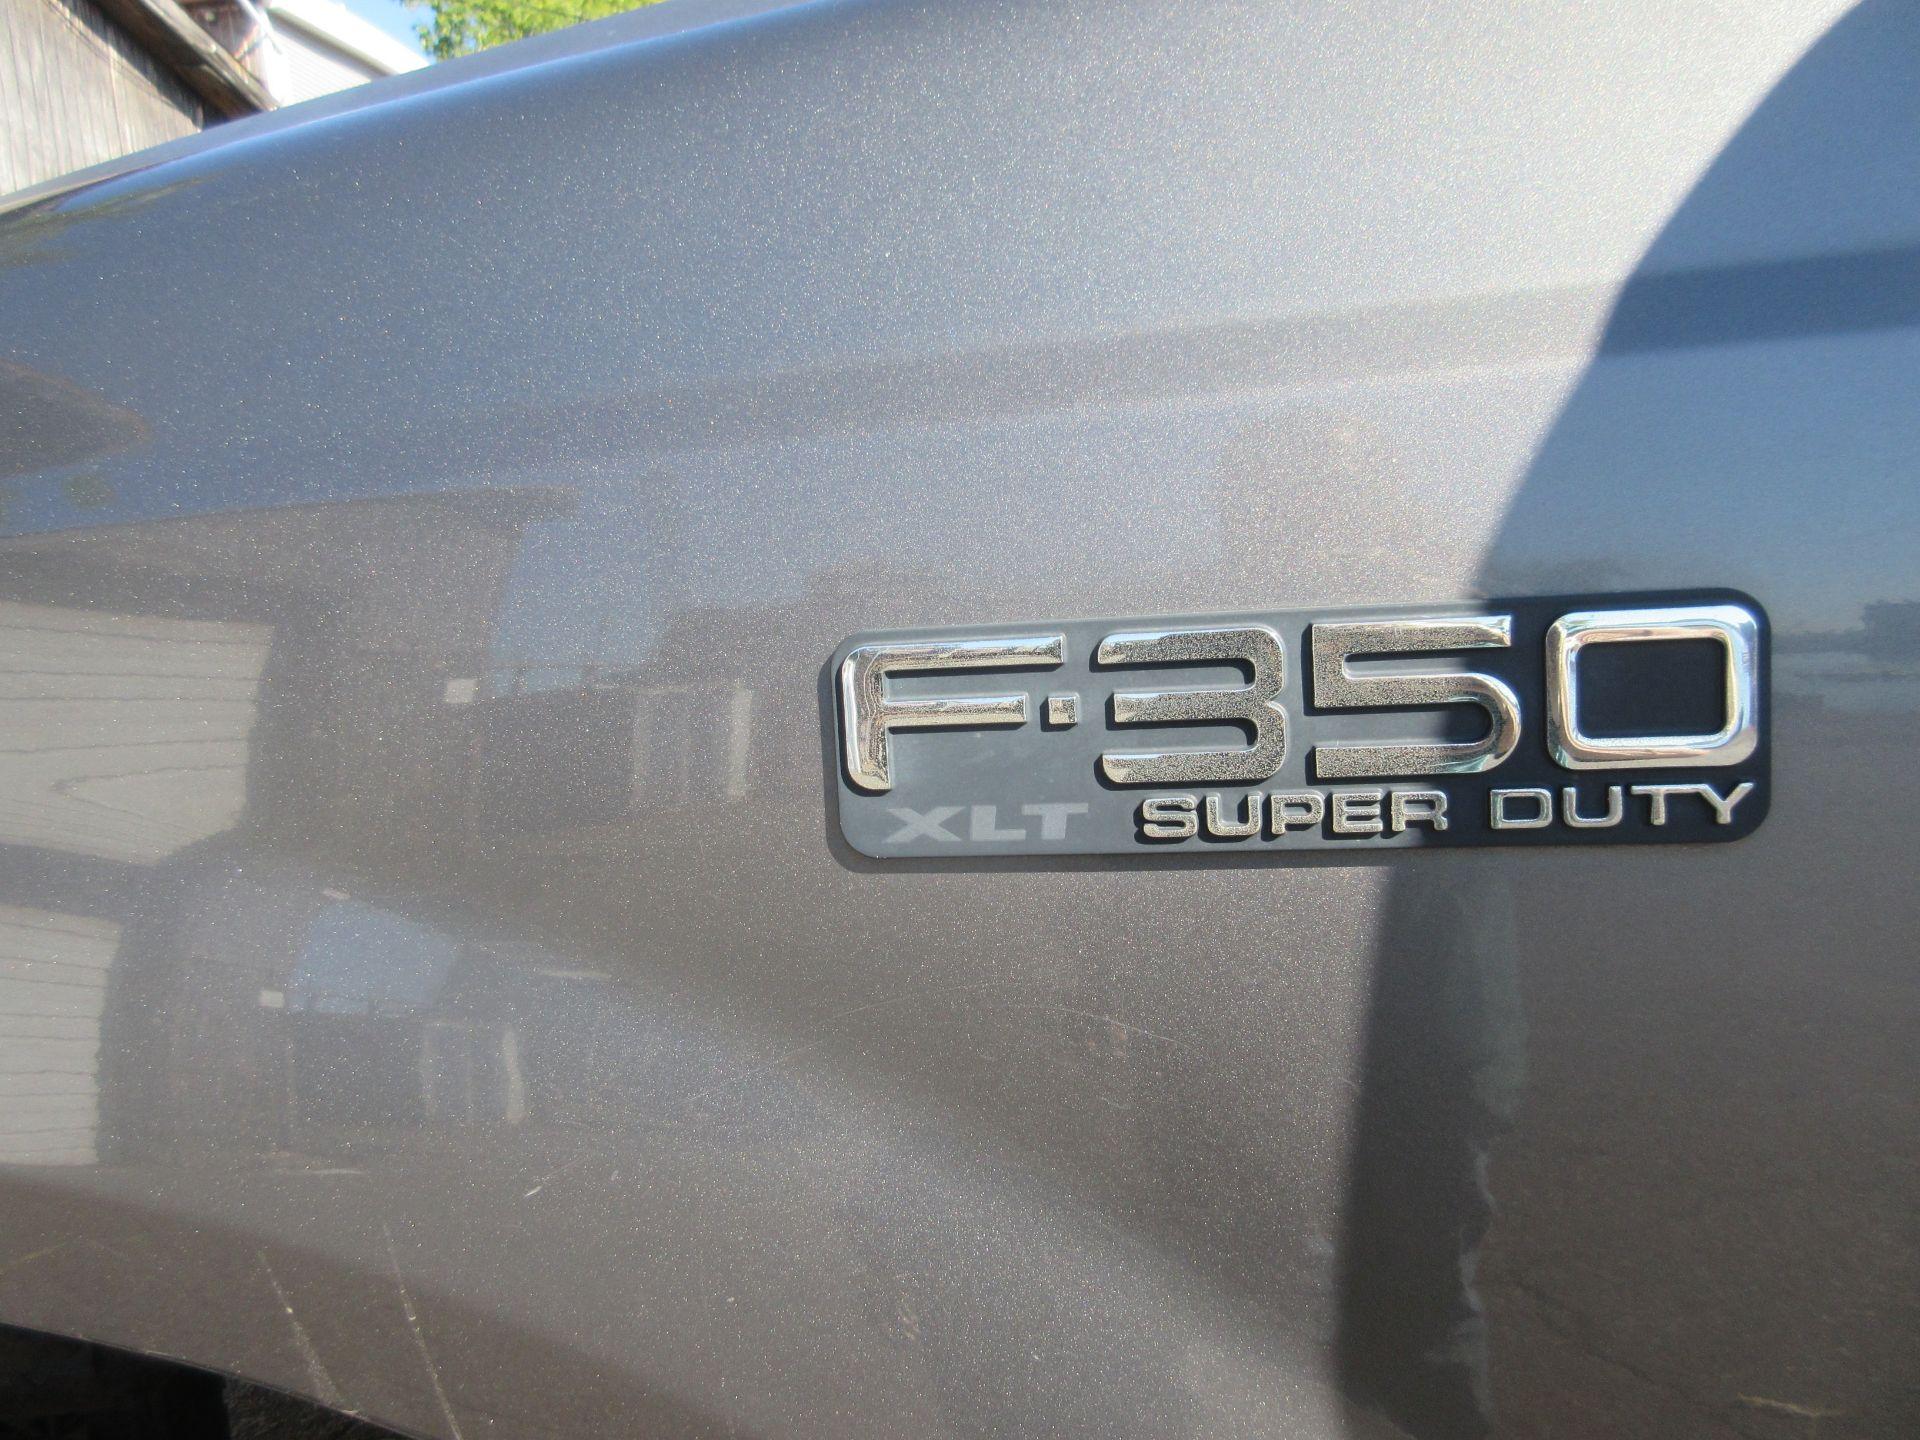 2002 Ford F-350 XLT Super Duty Power Stroke Flatbed Truck VIN 1FDWF37F62EB29656, Reading Body, - Image 13 of 13